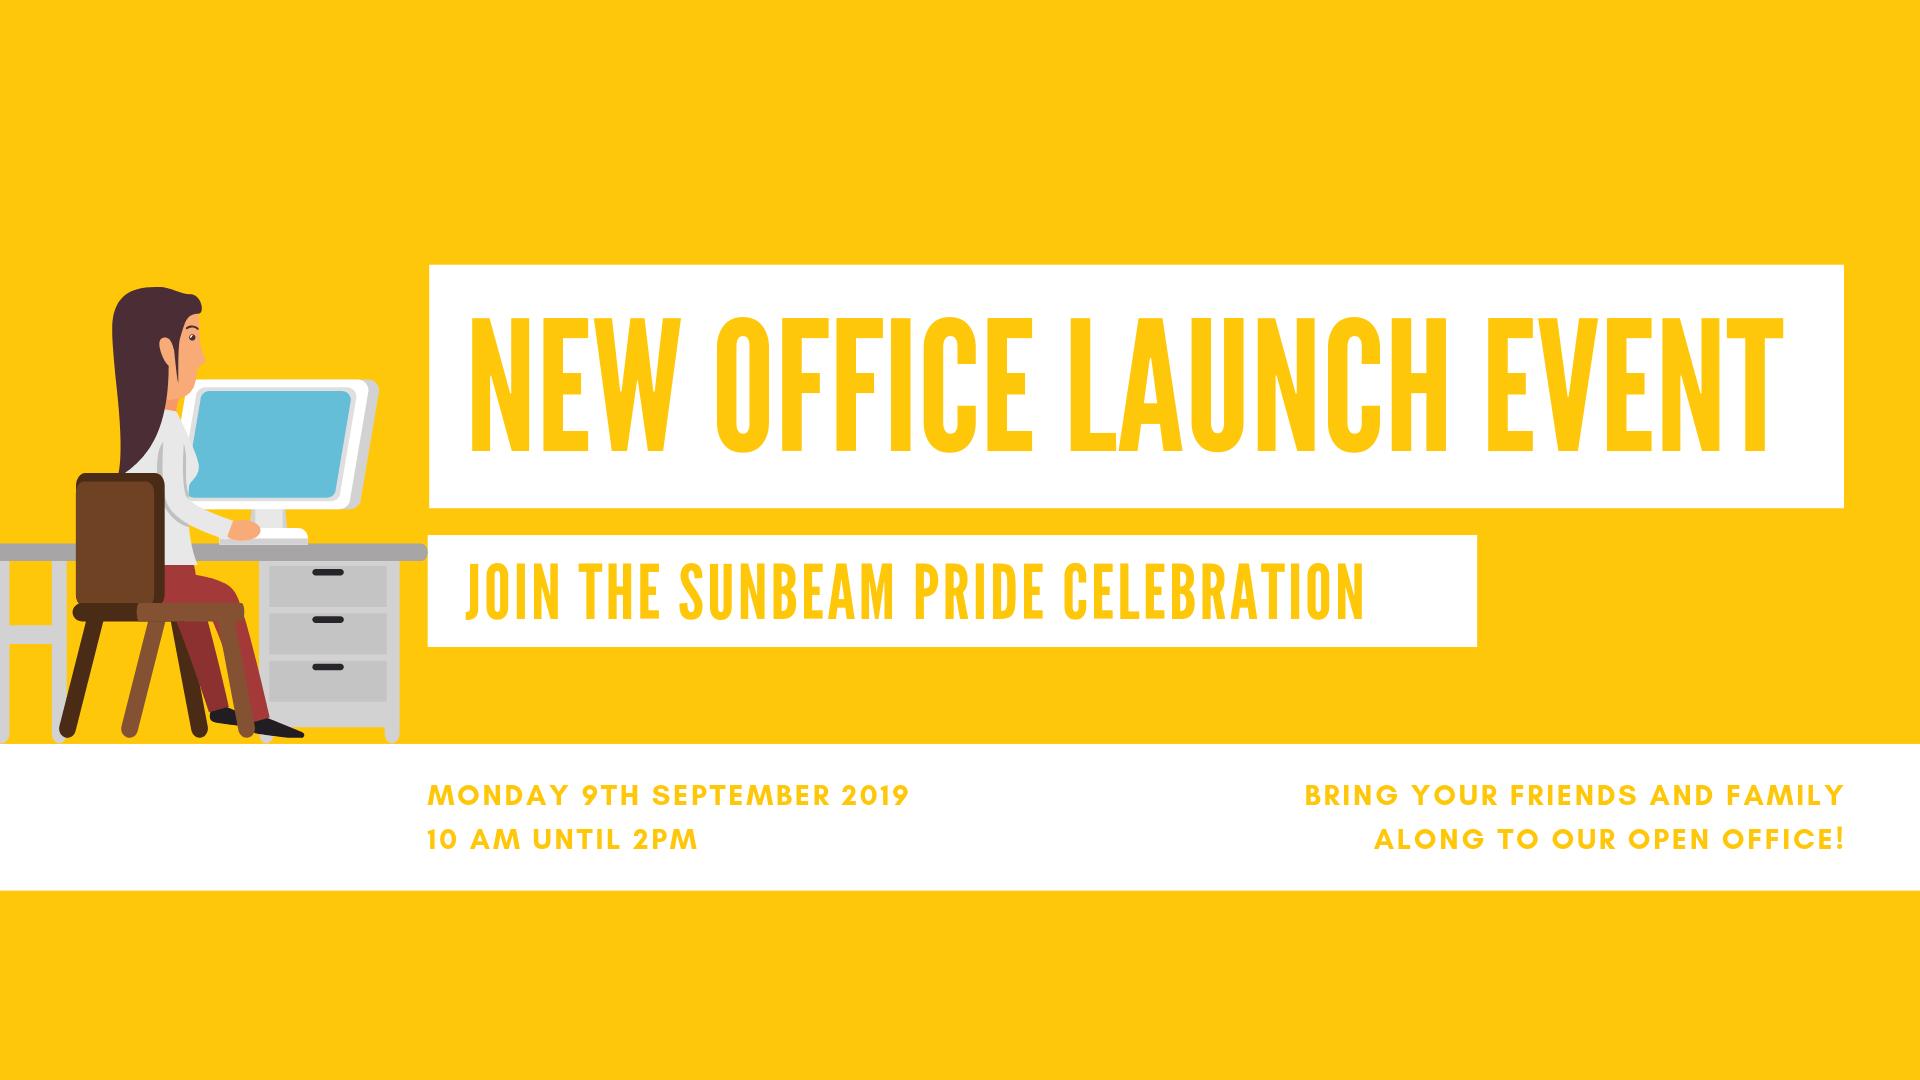 Sunbeam Pride Office Launch Event